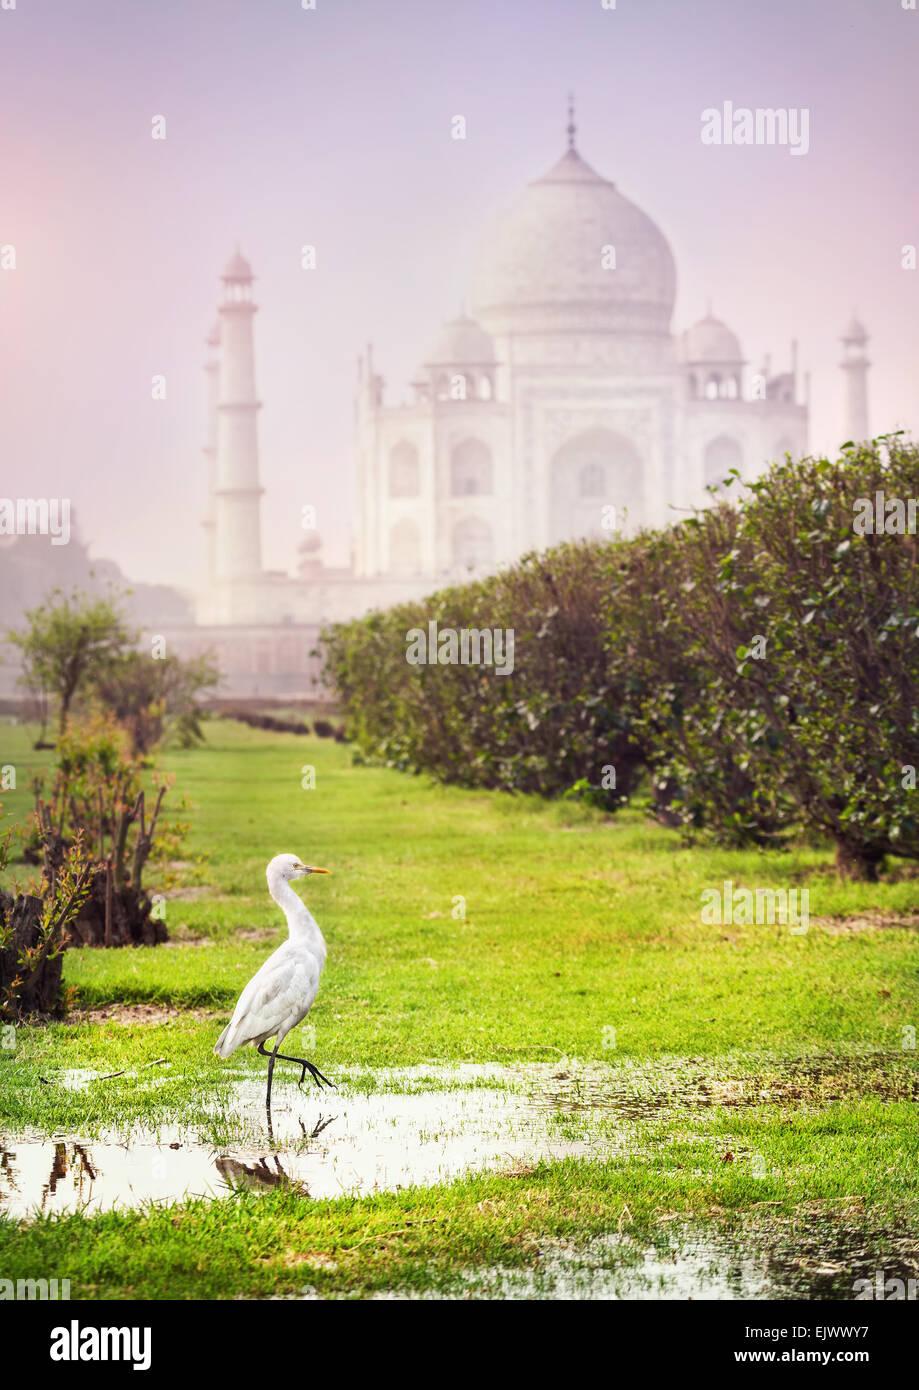 Airone bianco in Mehtab Bagh giardino con Taj Mahal vista in Agra, Uttar Pradesh, India Immagini Stock